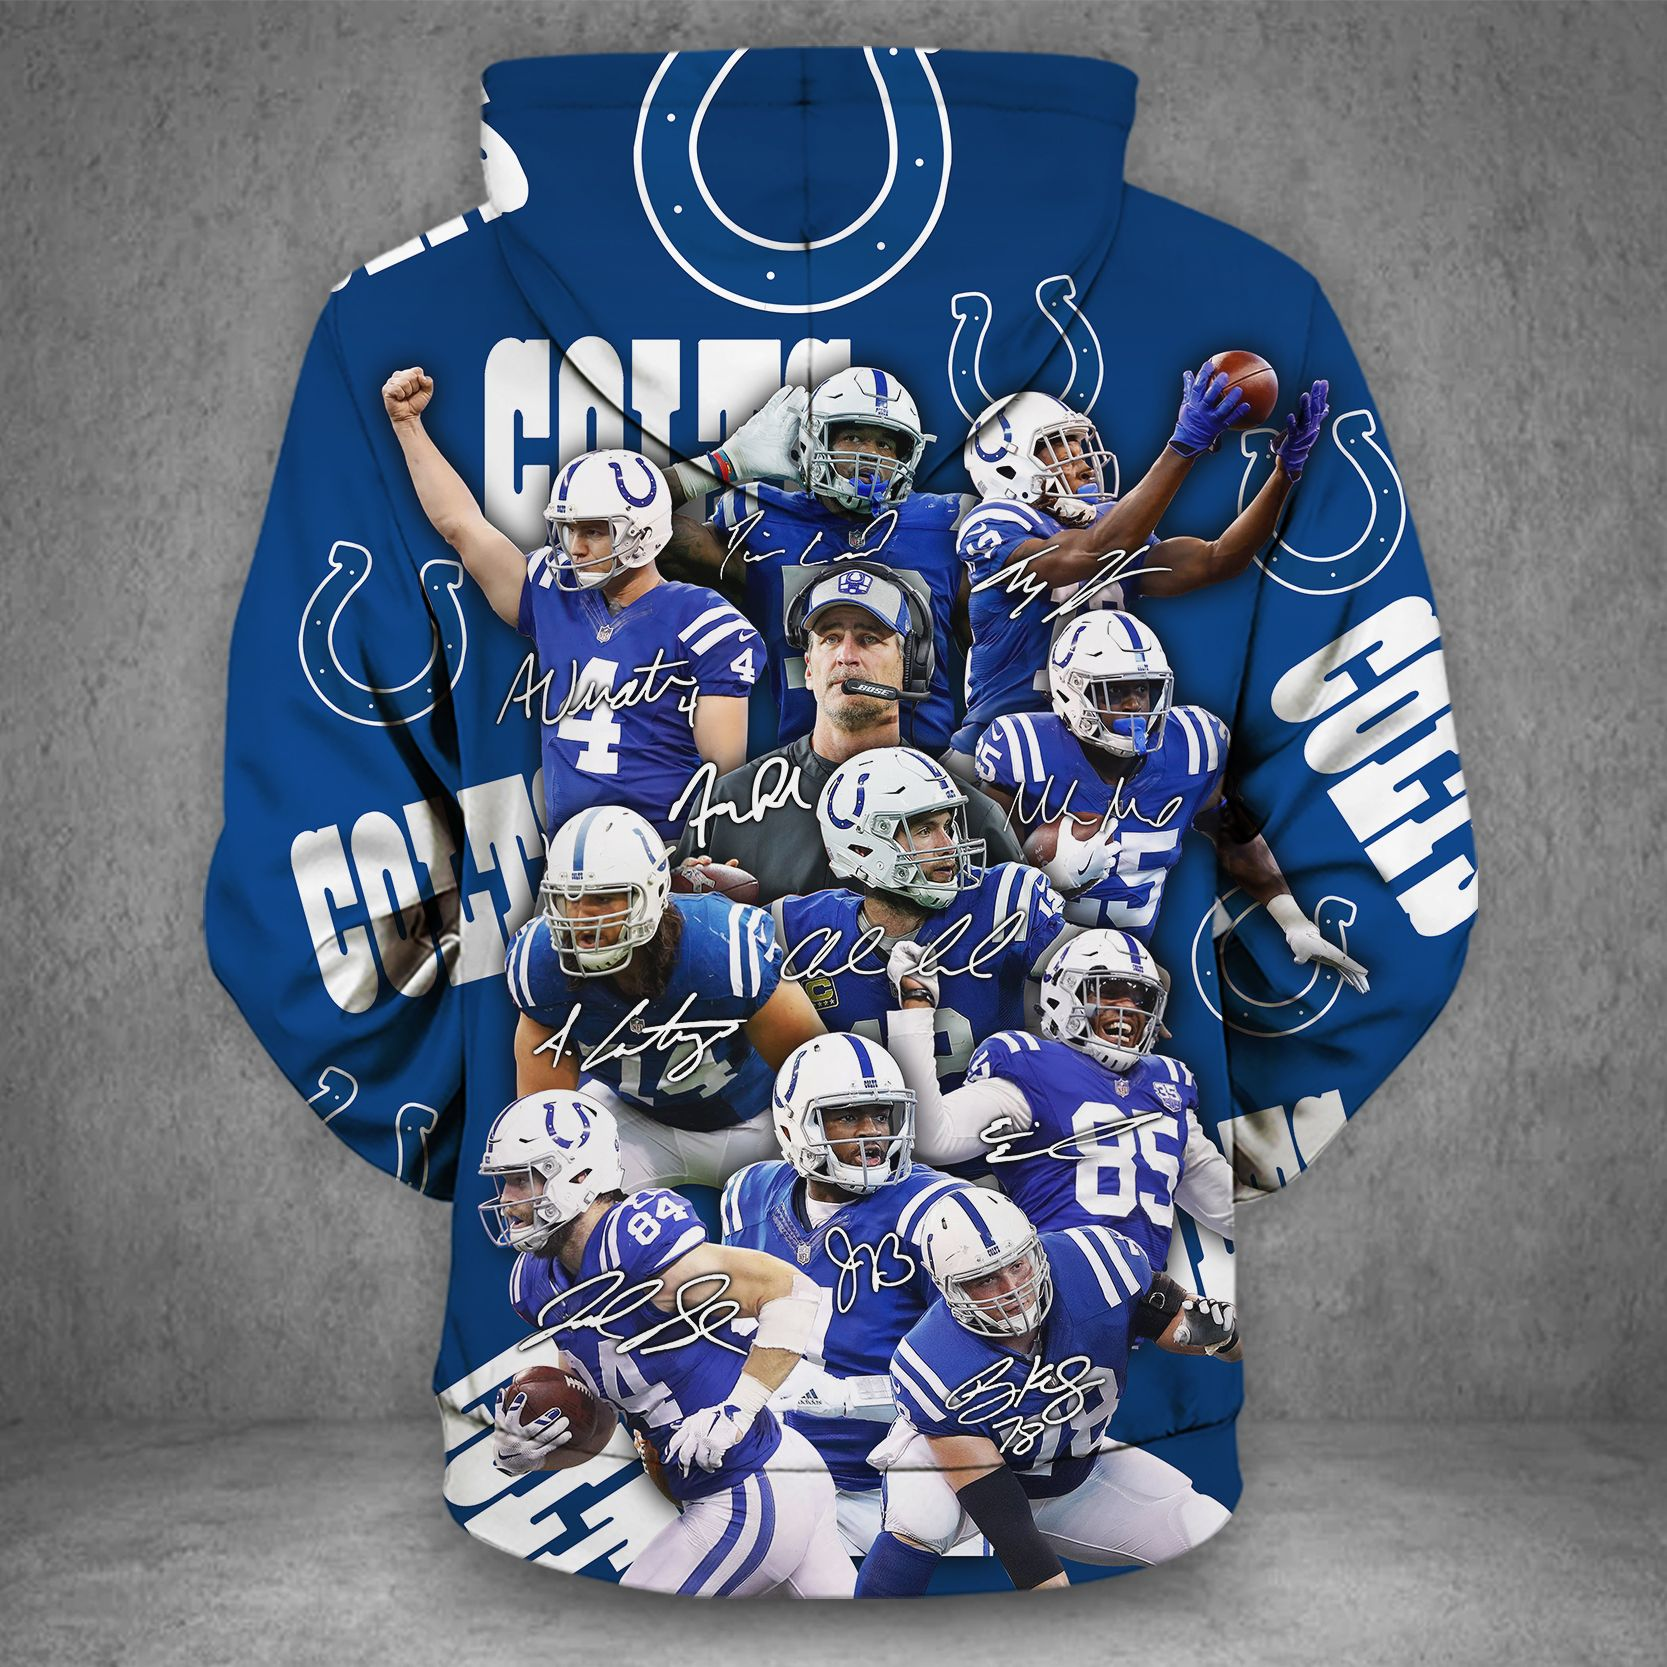 Men Women Indianapolis Colts 3d Hoodie Indianapolis Colts Hoodie Nfl Indianapolis Colts A Sport Outfits Indianapolis Colts 3d Sweatshirts [ 1667 x 1667 Pixel ]